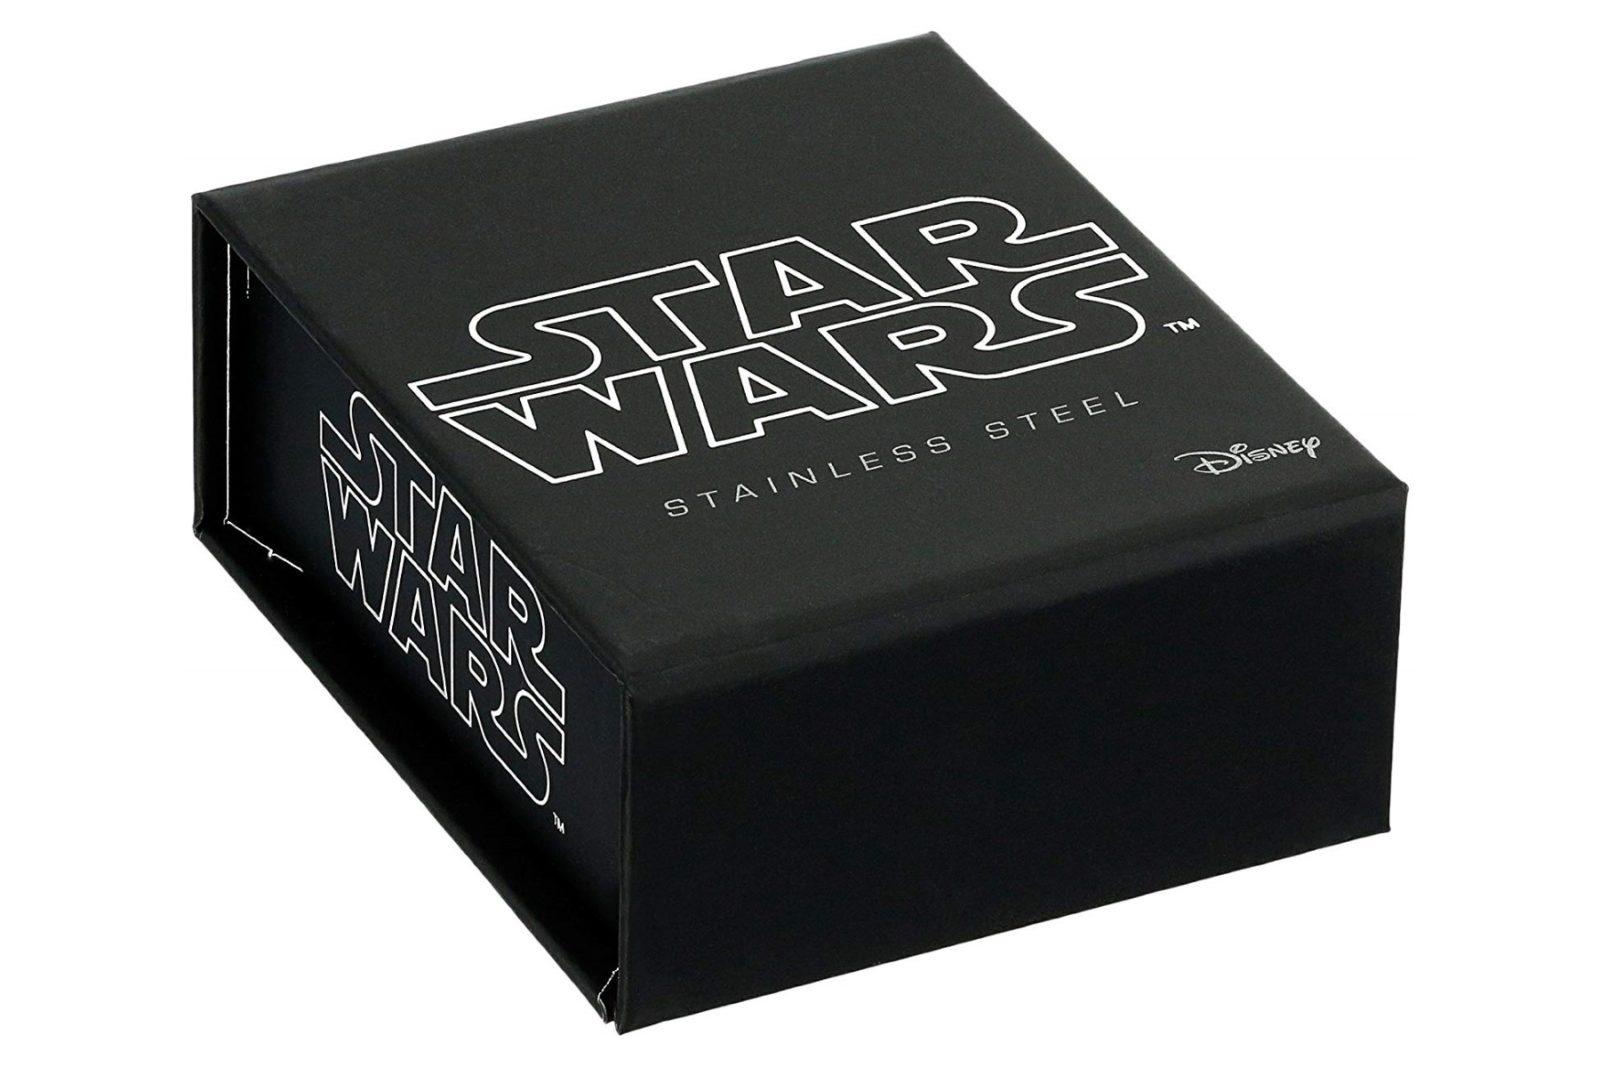 Star Wars R2-D2 Rhinestone Necklace on Amazon